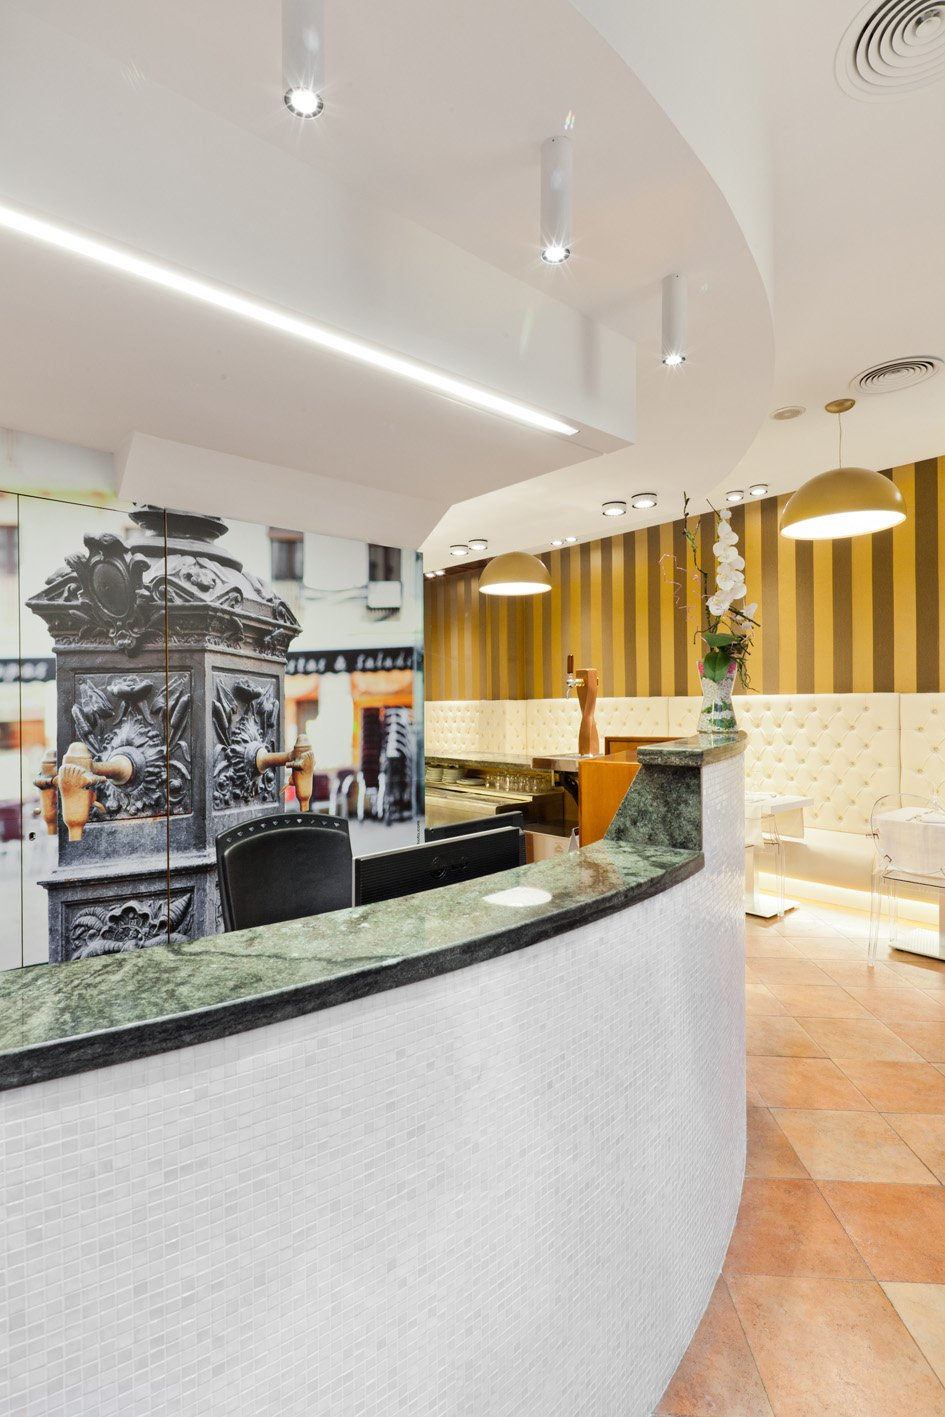 hotel_la_fontnombre_del_documento_30-0945248980a8486c9c671fff10ee9fbc